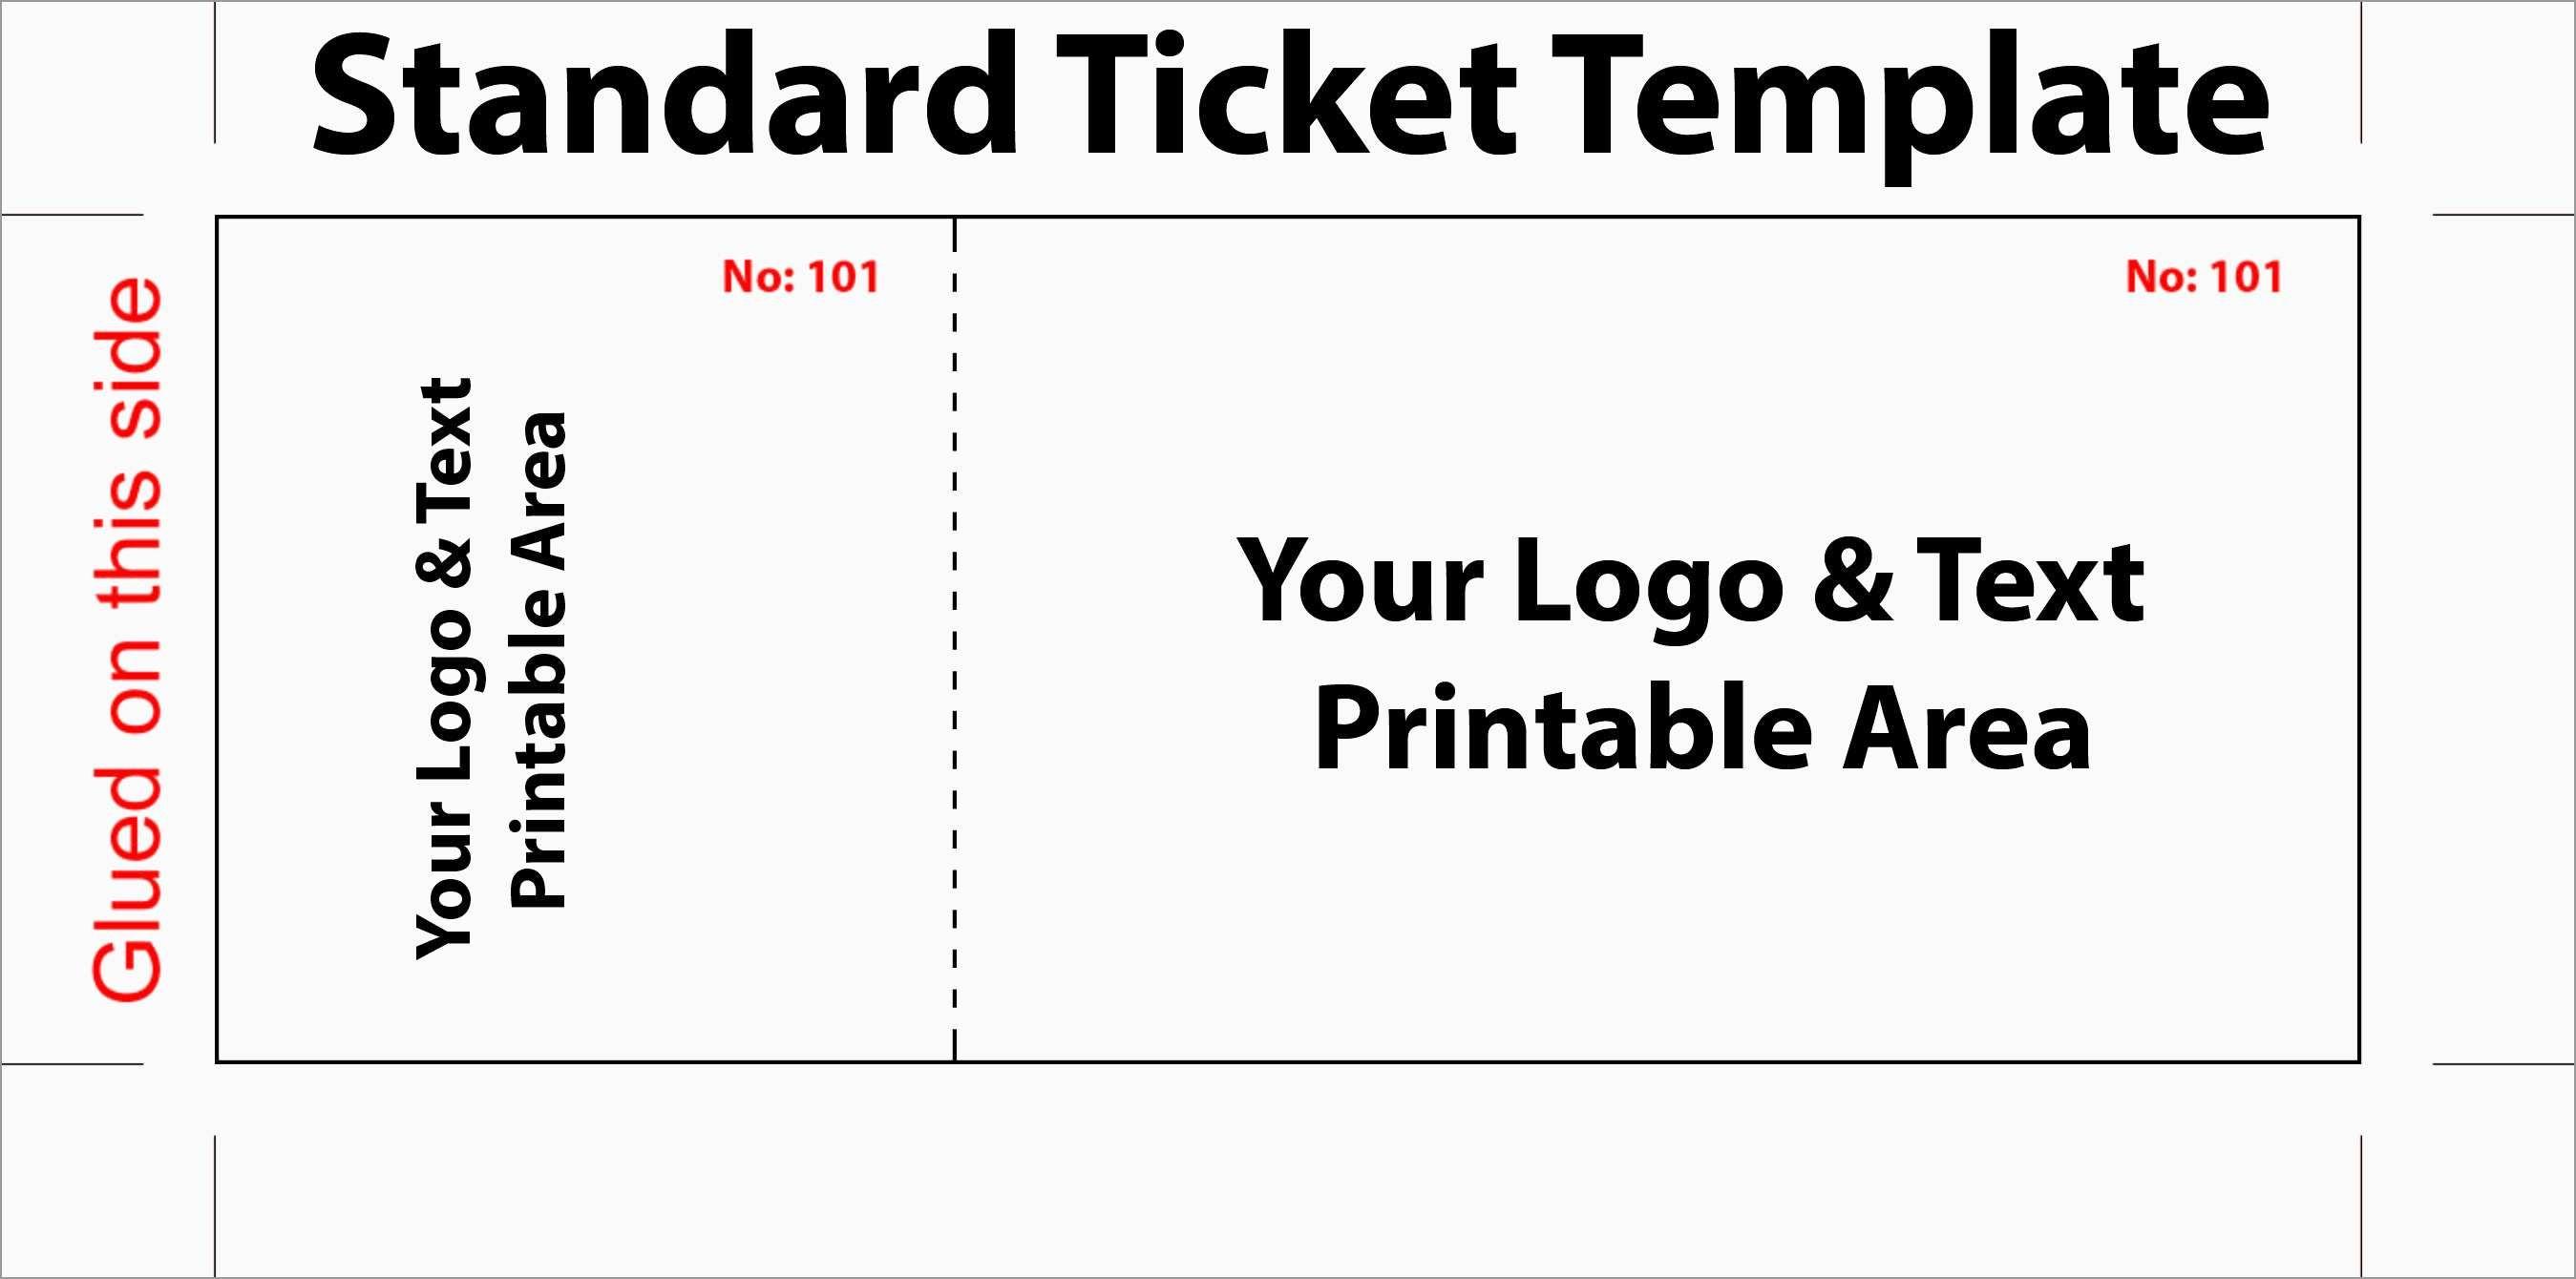 New Free Printable Raffle Ticket Template Download   Best Of Template - Free Printable Raffle Ticket Template Download